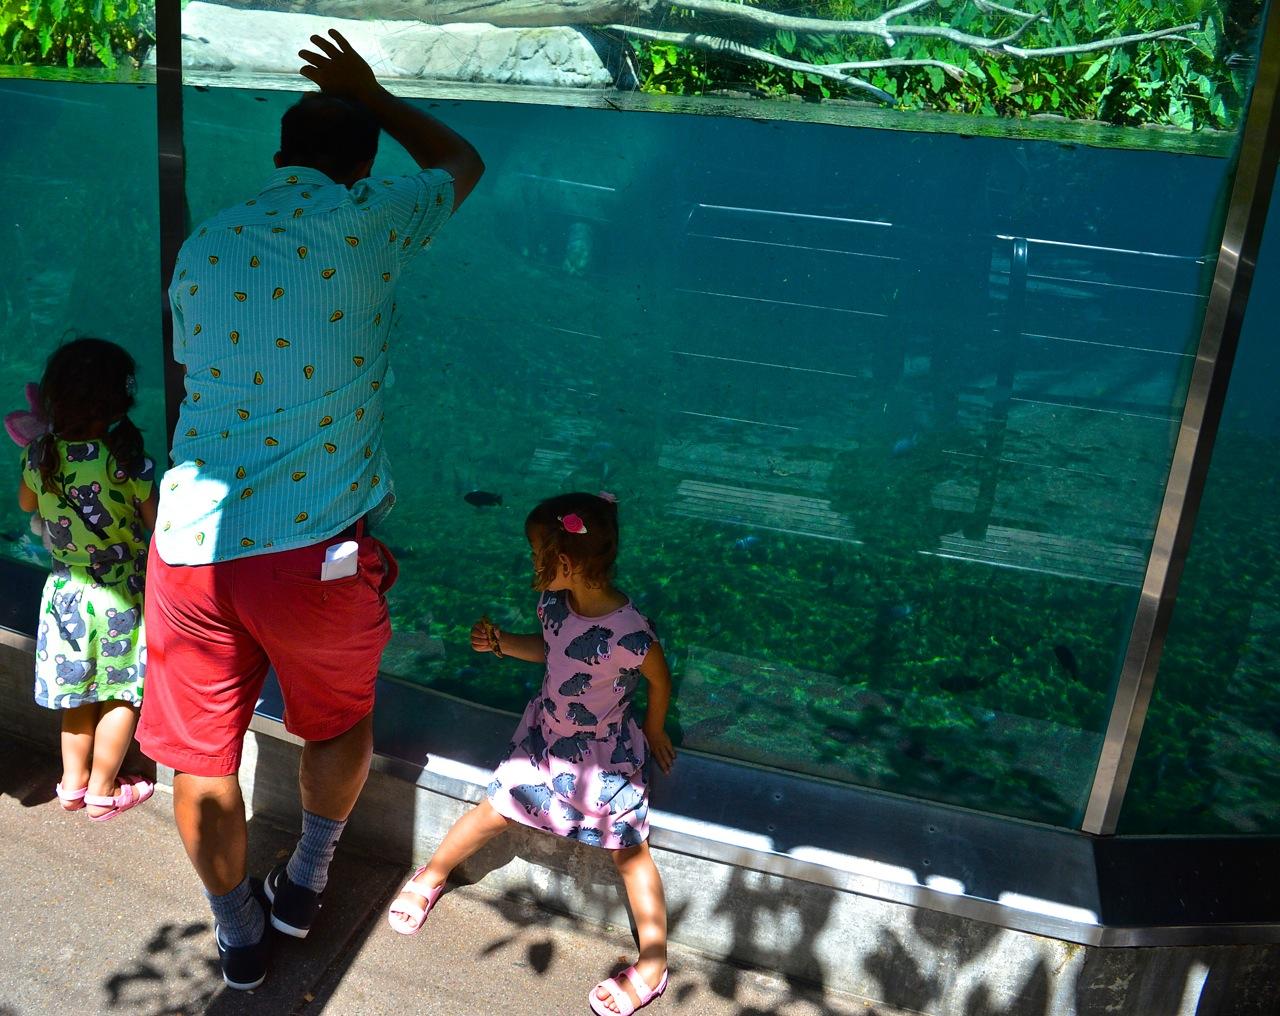 San Diego Zoo July 2018 17.jpg